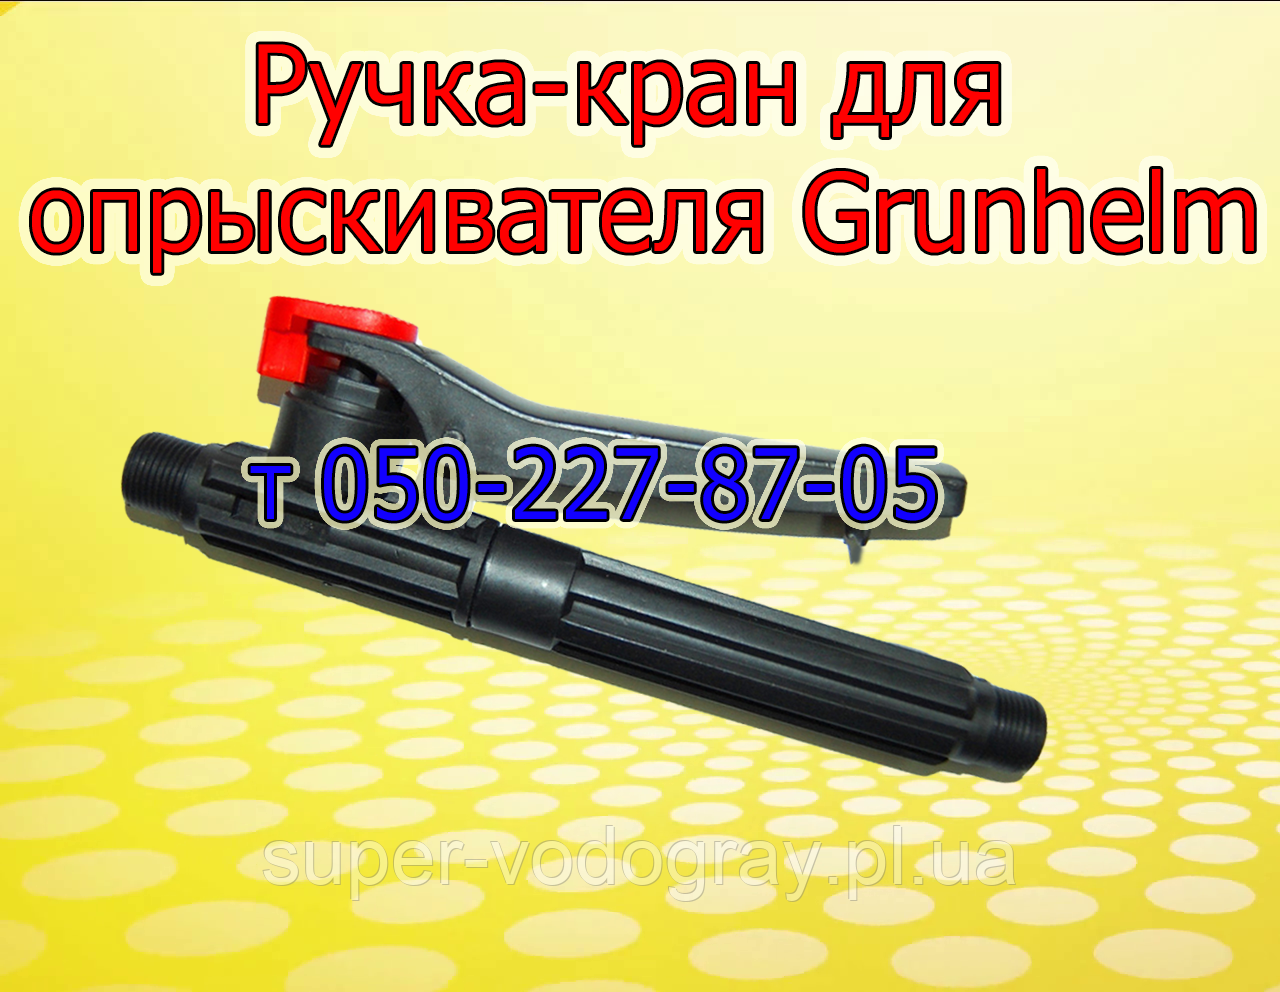 Ручка-кран для опрыскивателя Grunhelm